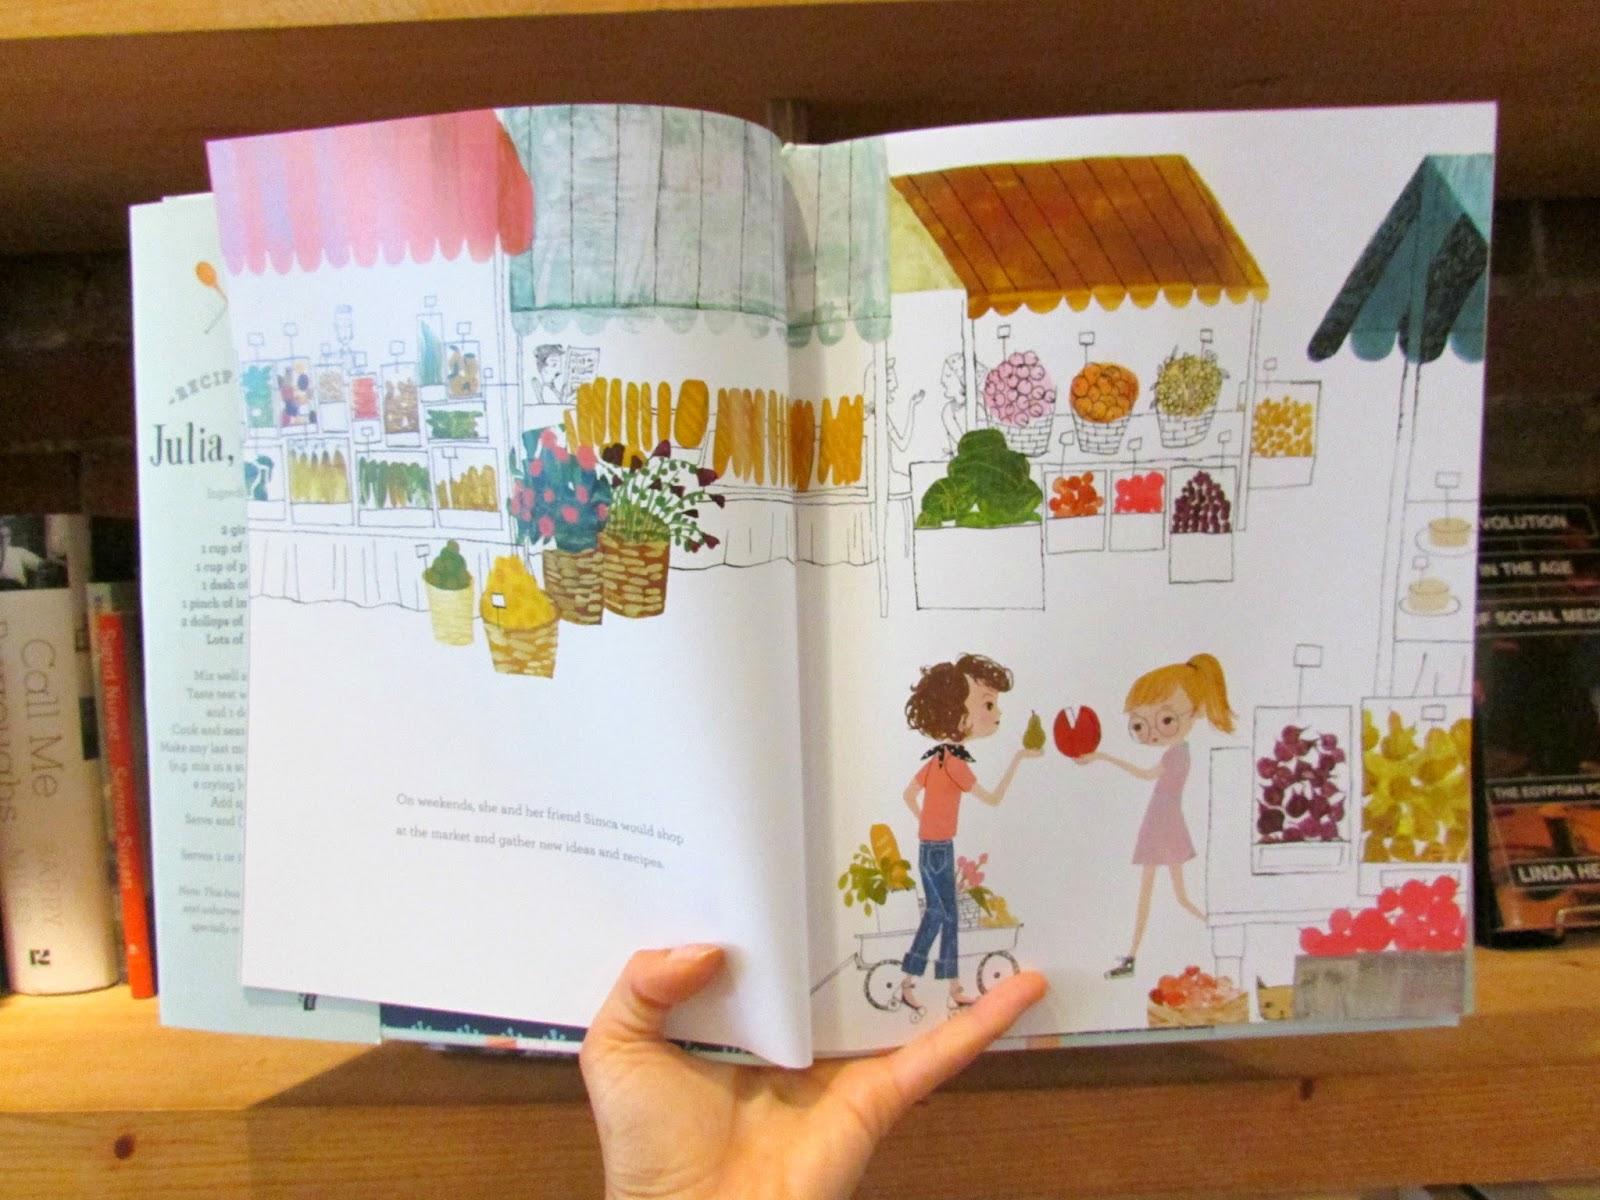 211 Bernard: This Week in Delightful Children's Books ...